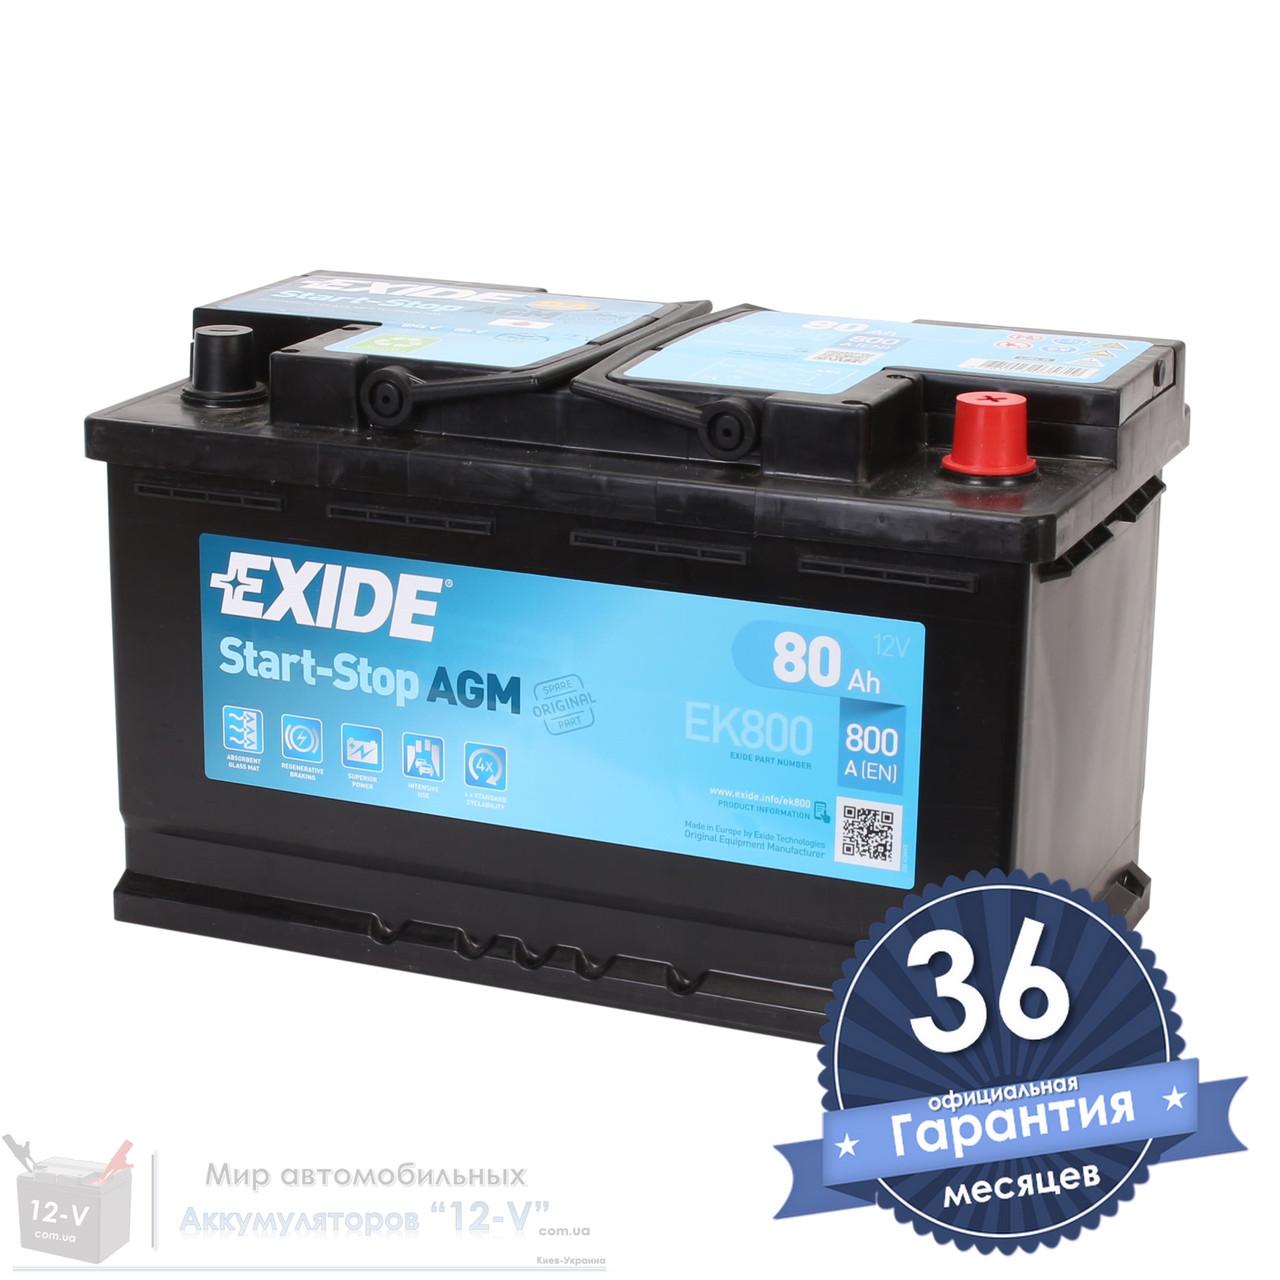 Аккумулятор автомобильный EXIDE AGM 6CT 80Ah, пусковой ток 800А [–|+] (EK800)